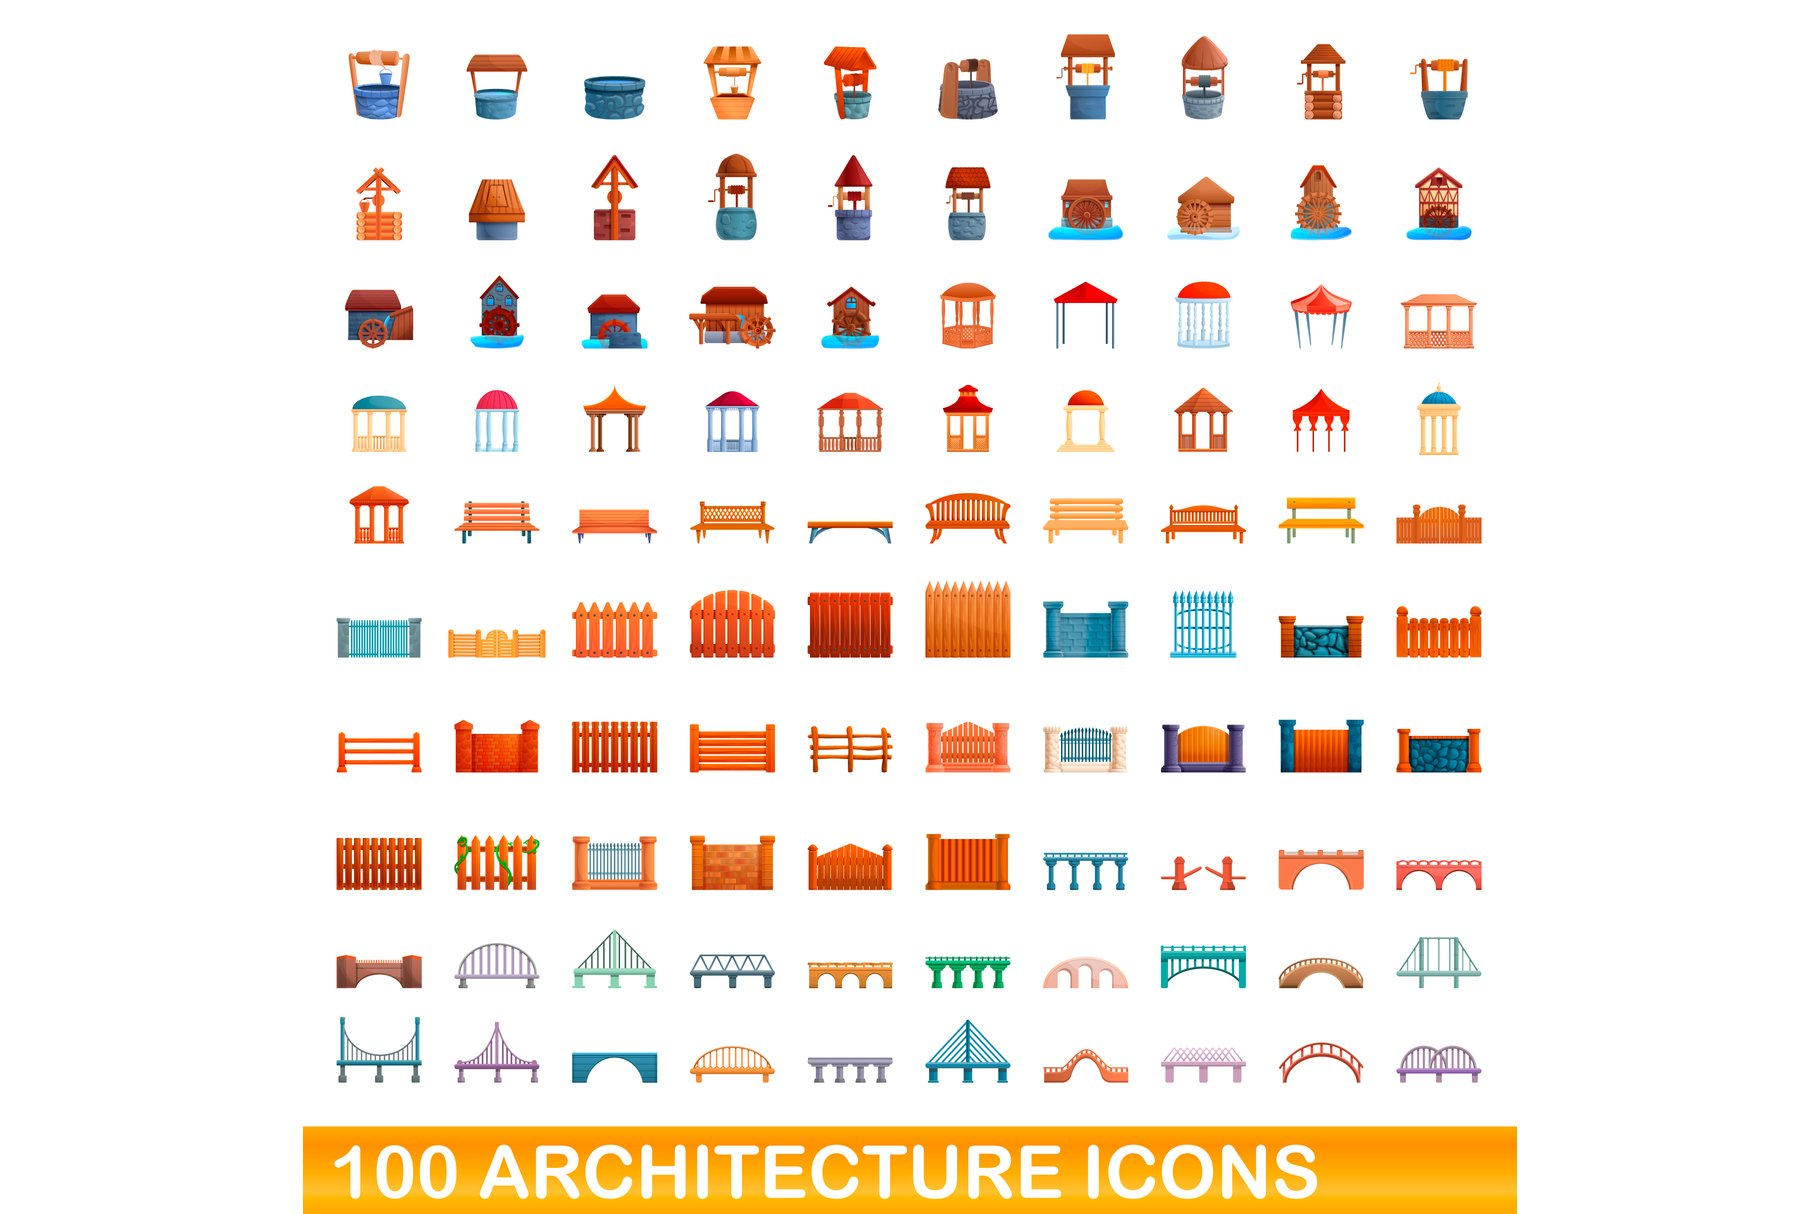 100 Architecture Icons Set Cartoon Style 568971 Illustrations Design Bundles